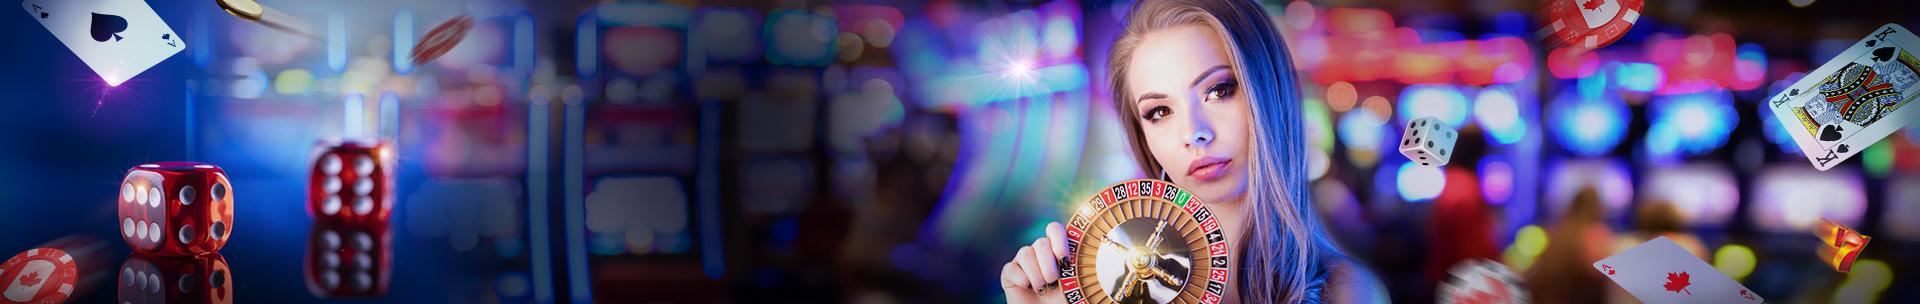 Csgo free betting sites